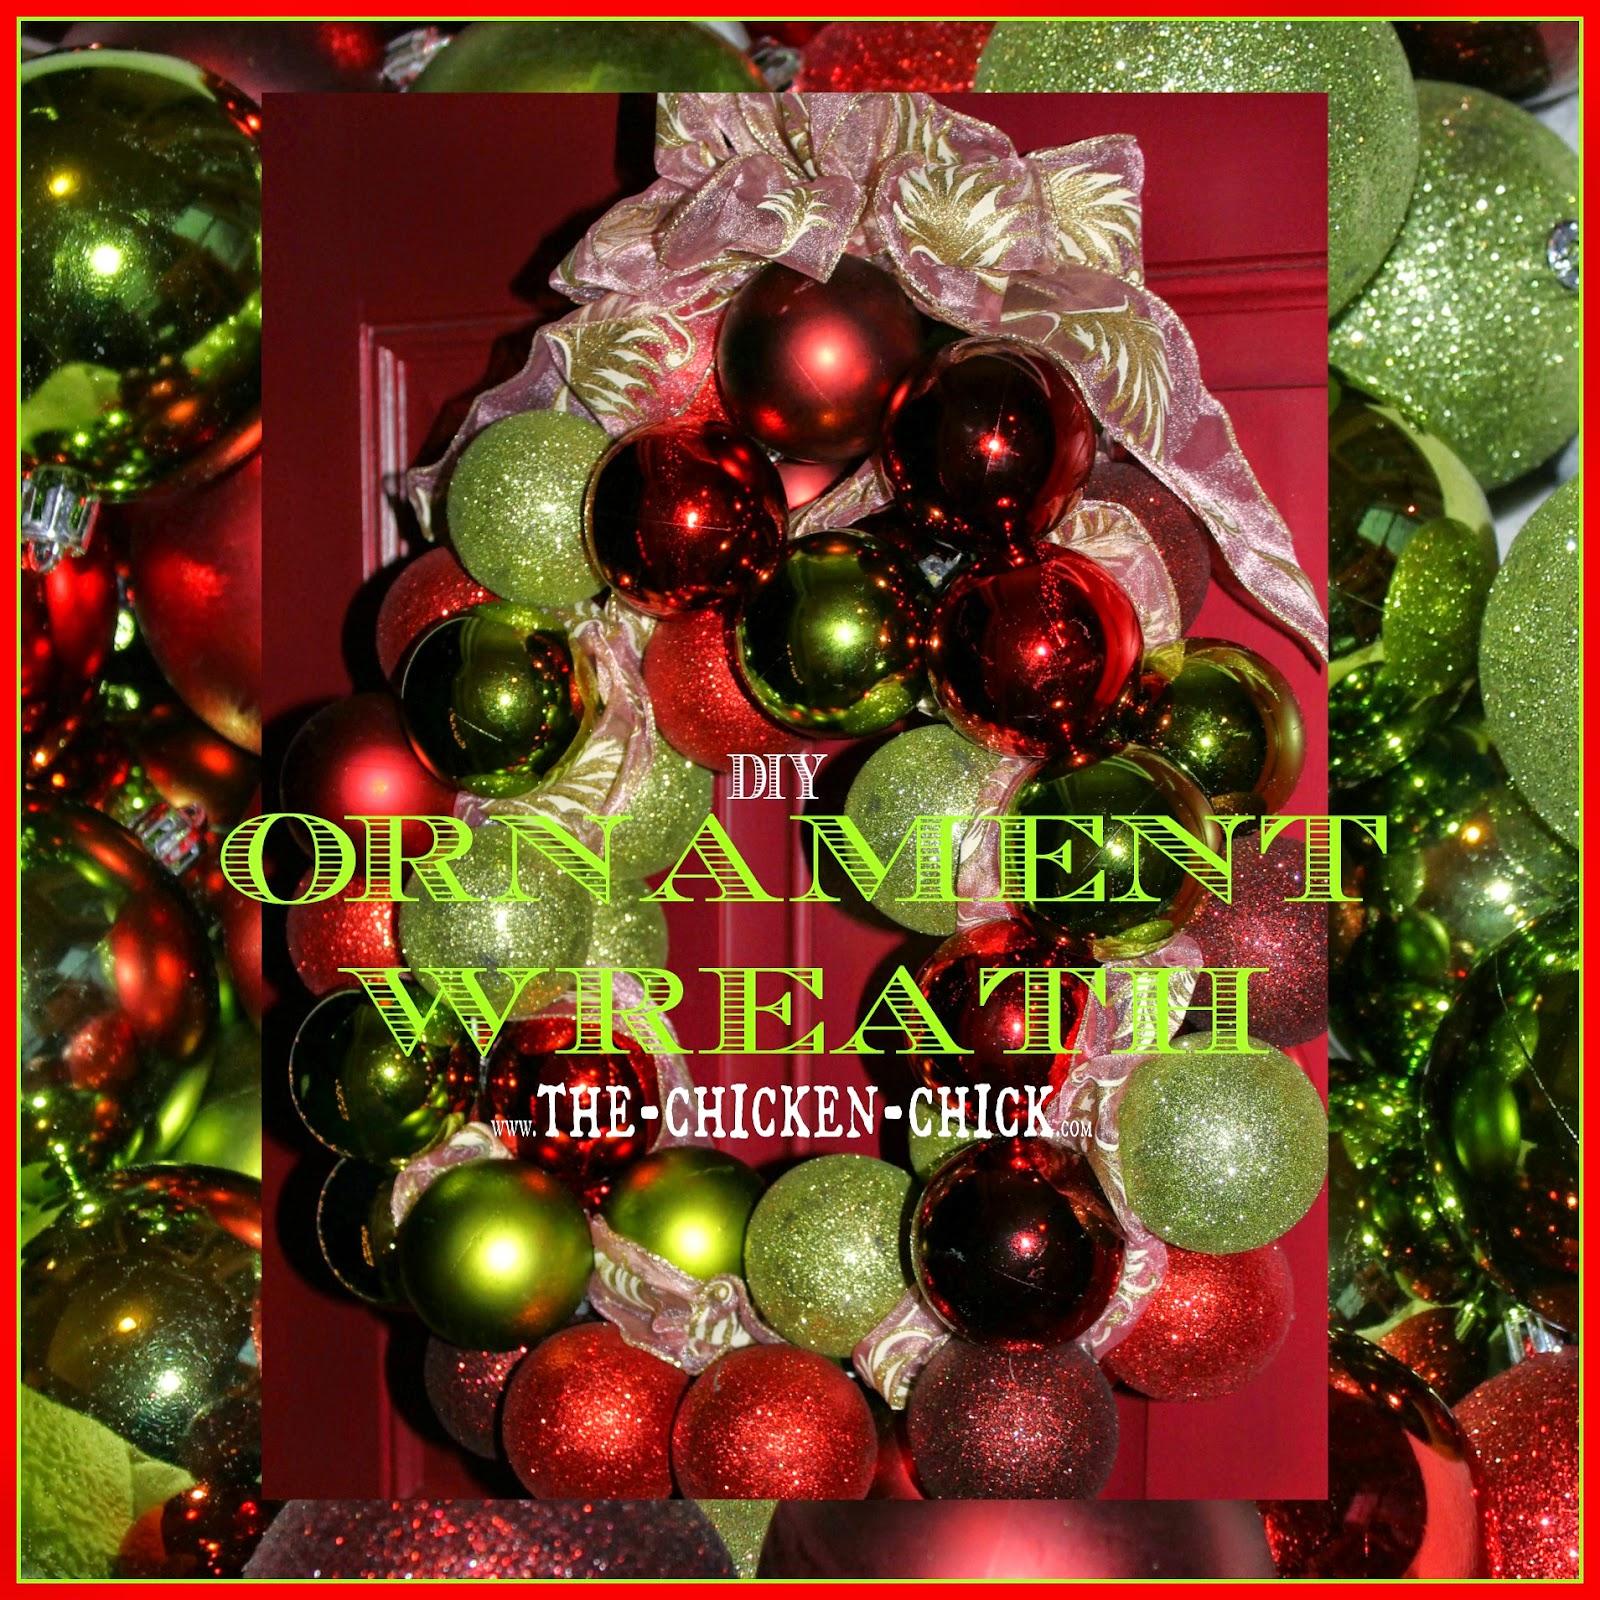 Diy Ornament Wreath The Chicken Chick